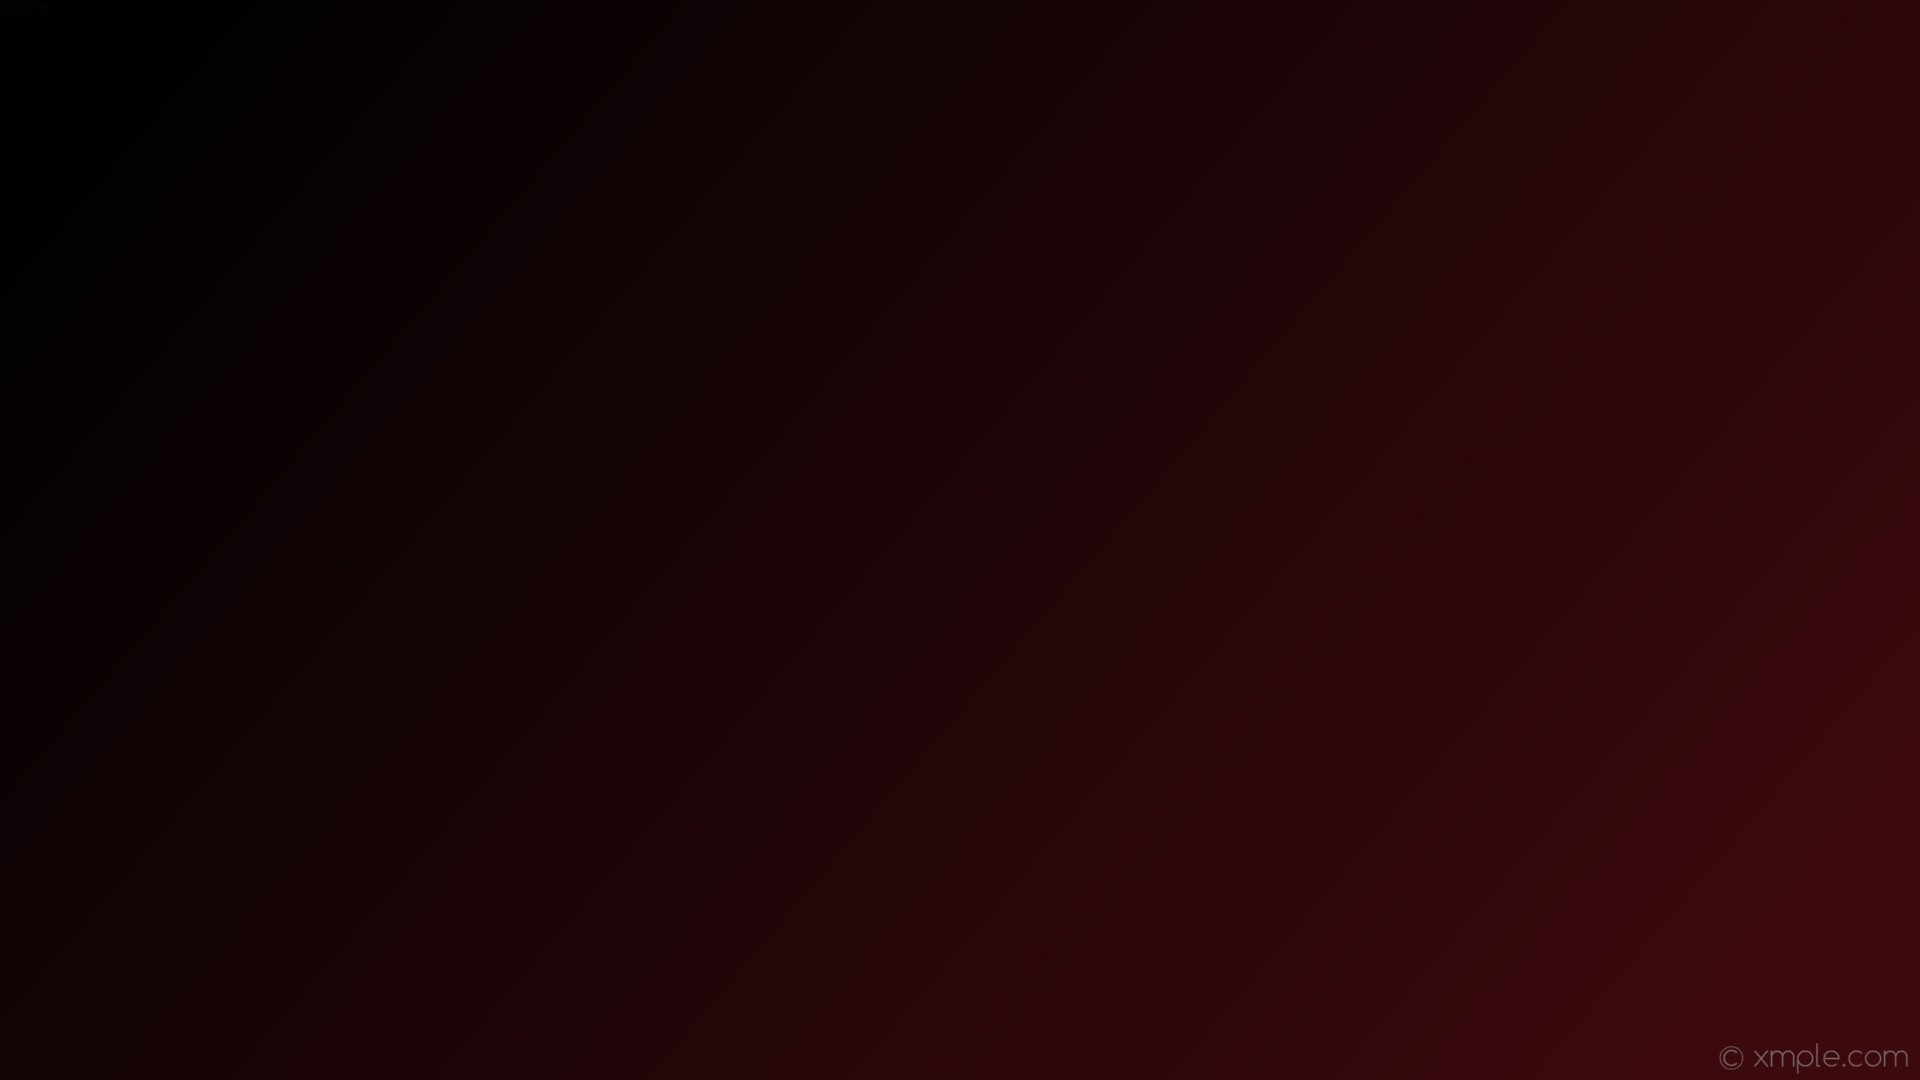 wallpaper linear black gradient red dark red #020101 #3c090e 165°